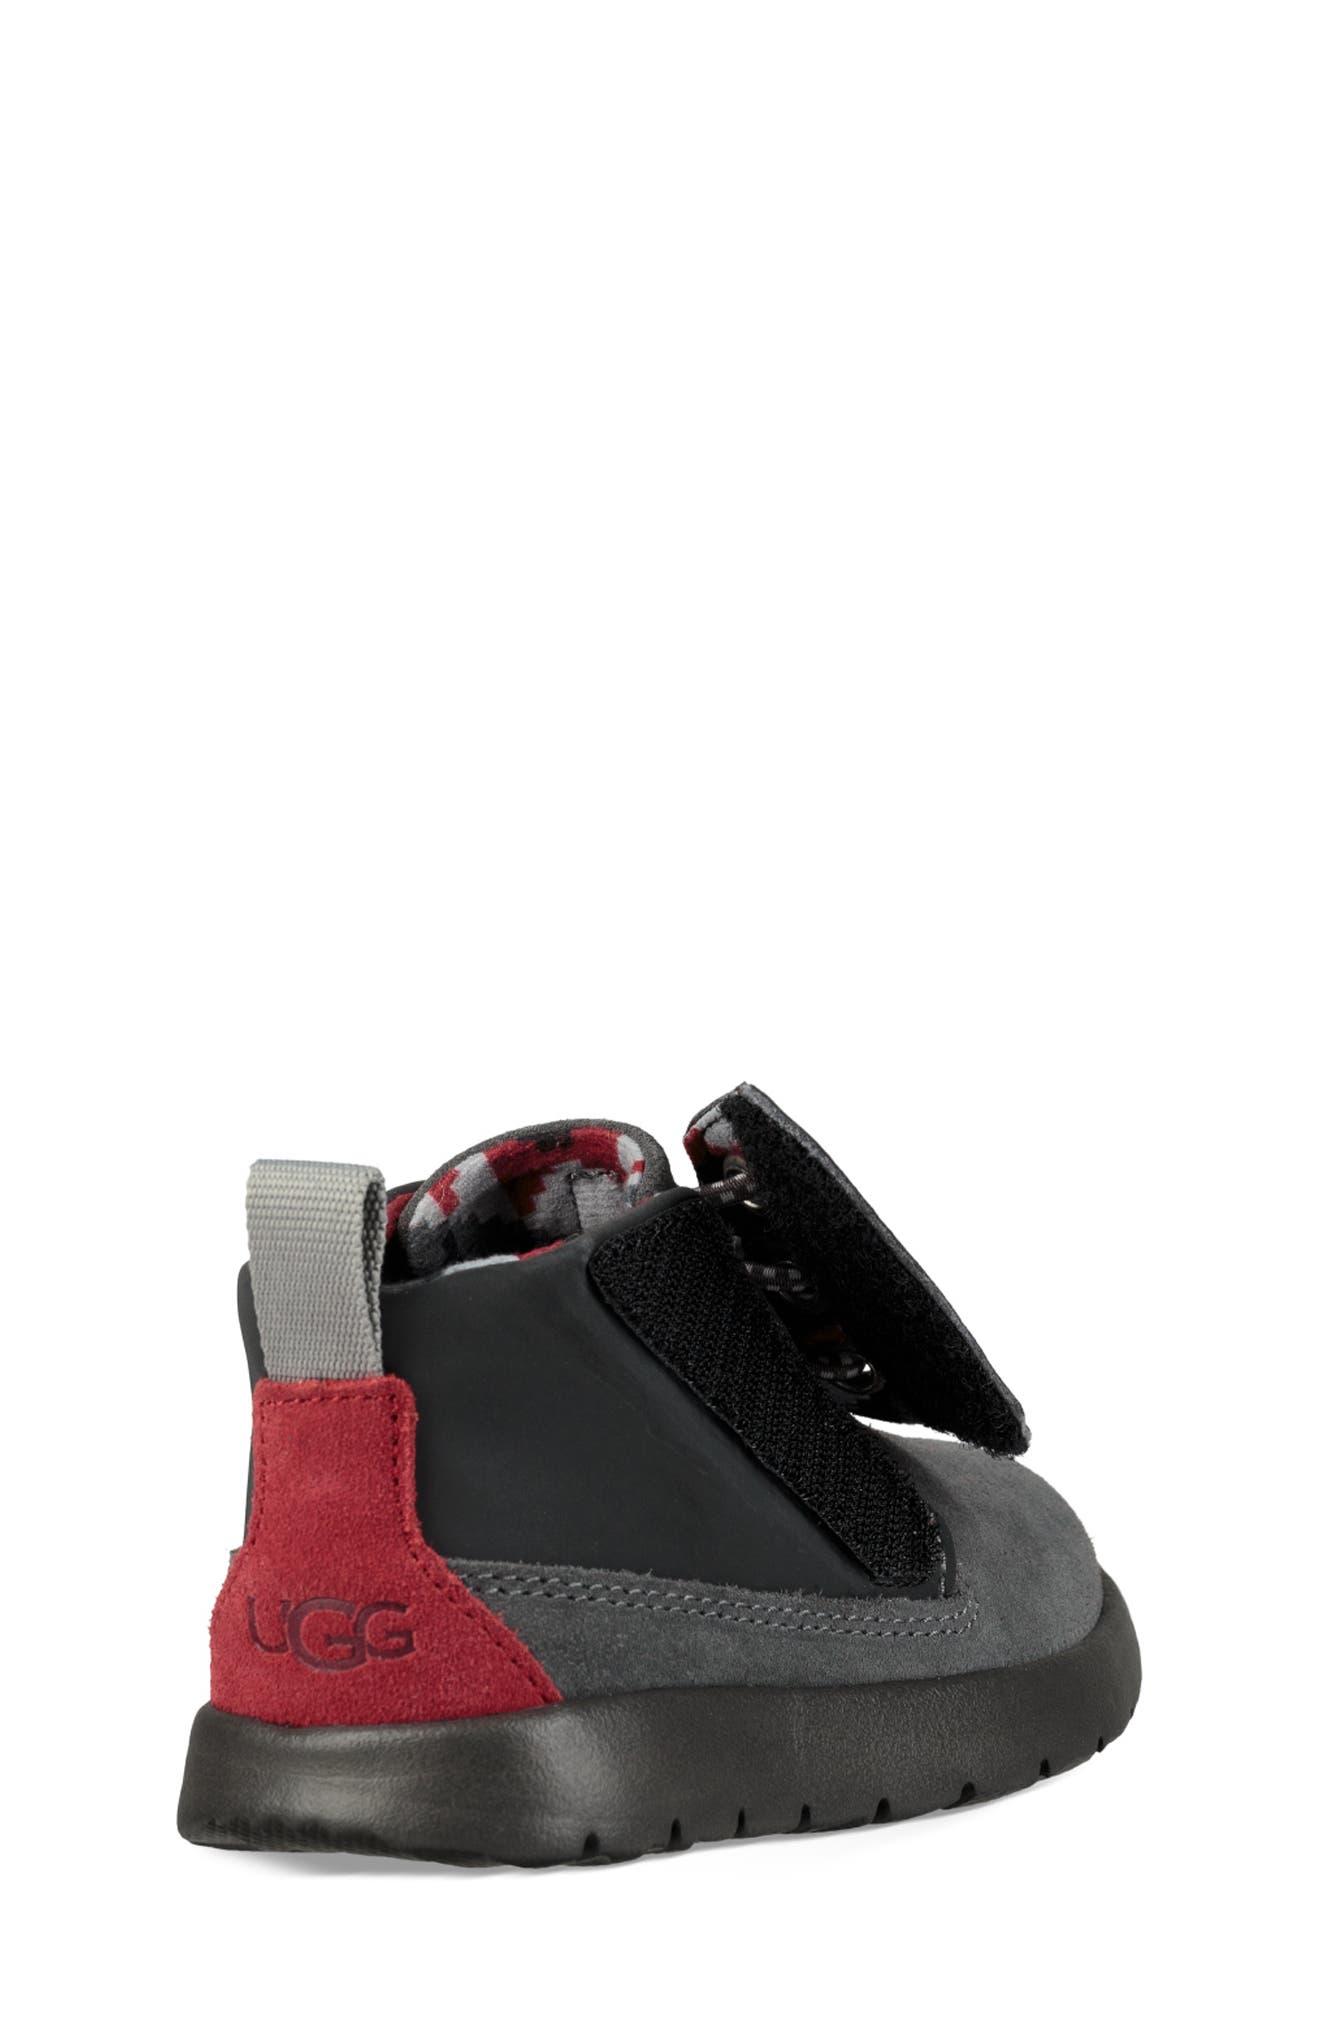 Canoe Chukka Sneaker,                             Alternate thumbnail 2, color,                             GREY / BLACK